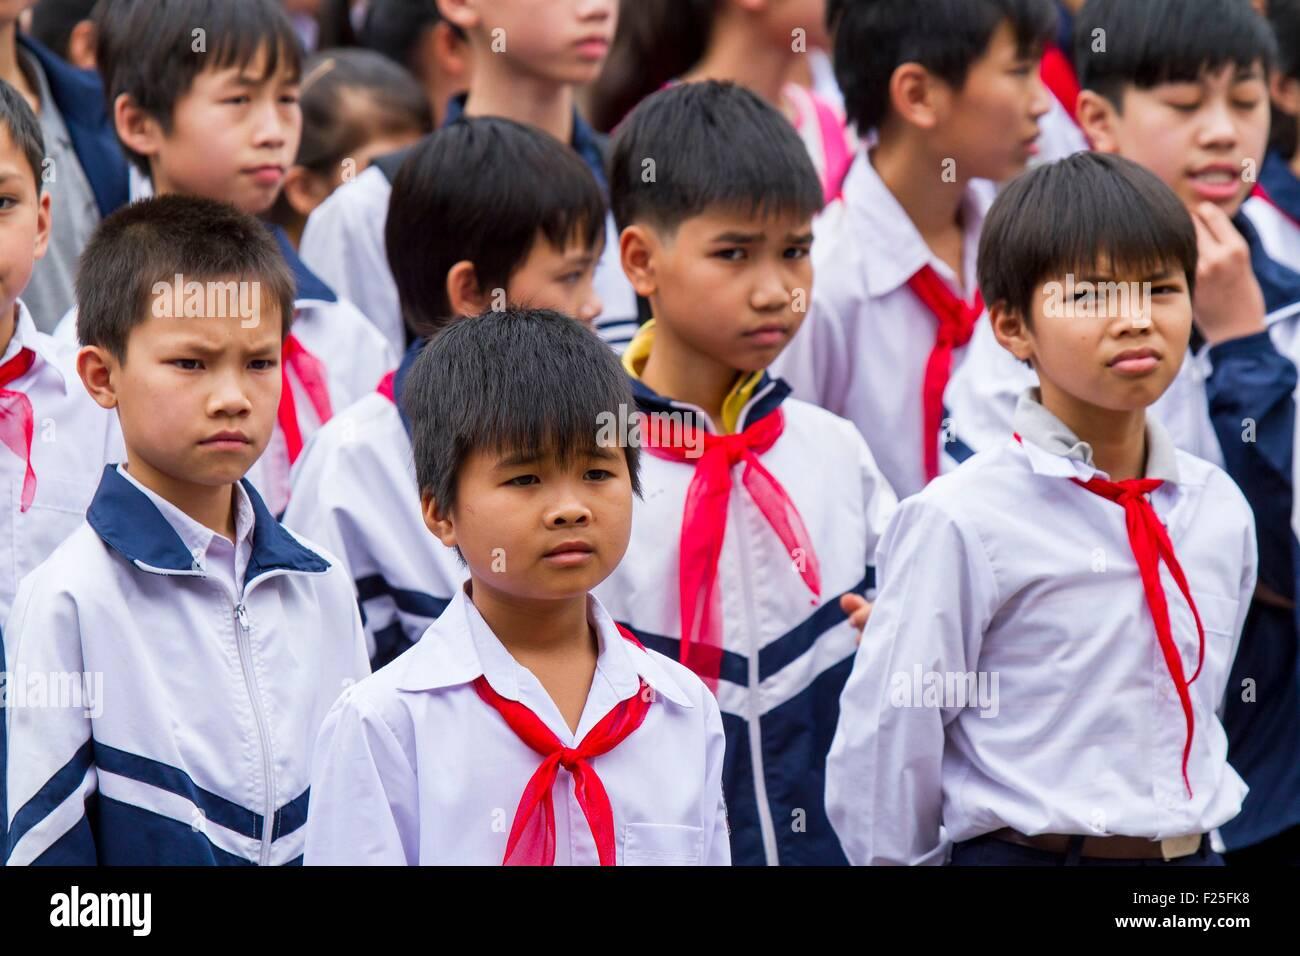 Vietnam, Hanoi, schoolchildren in the Temple of Literature - Stock Image